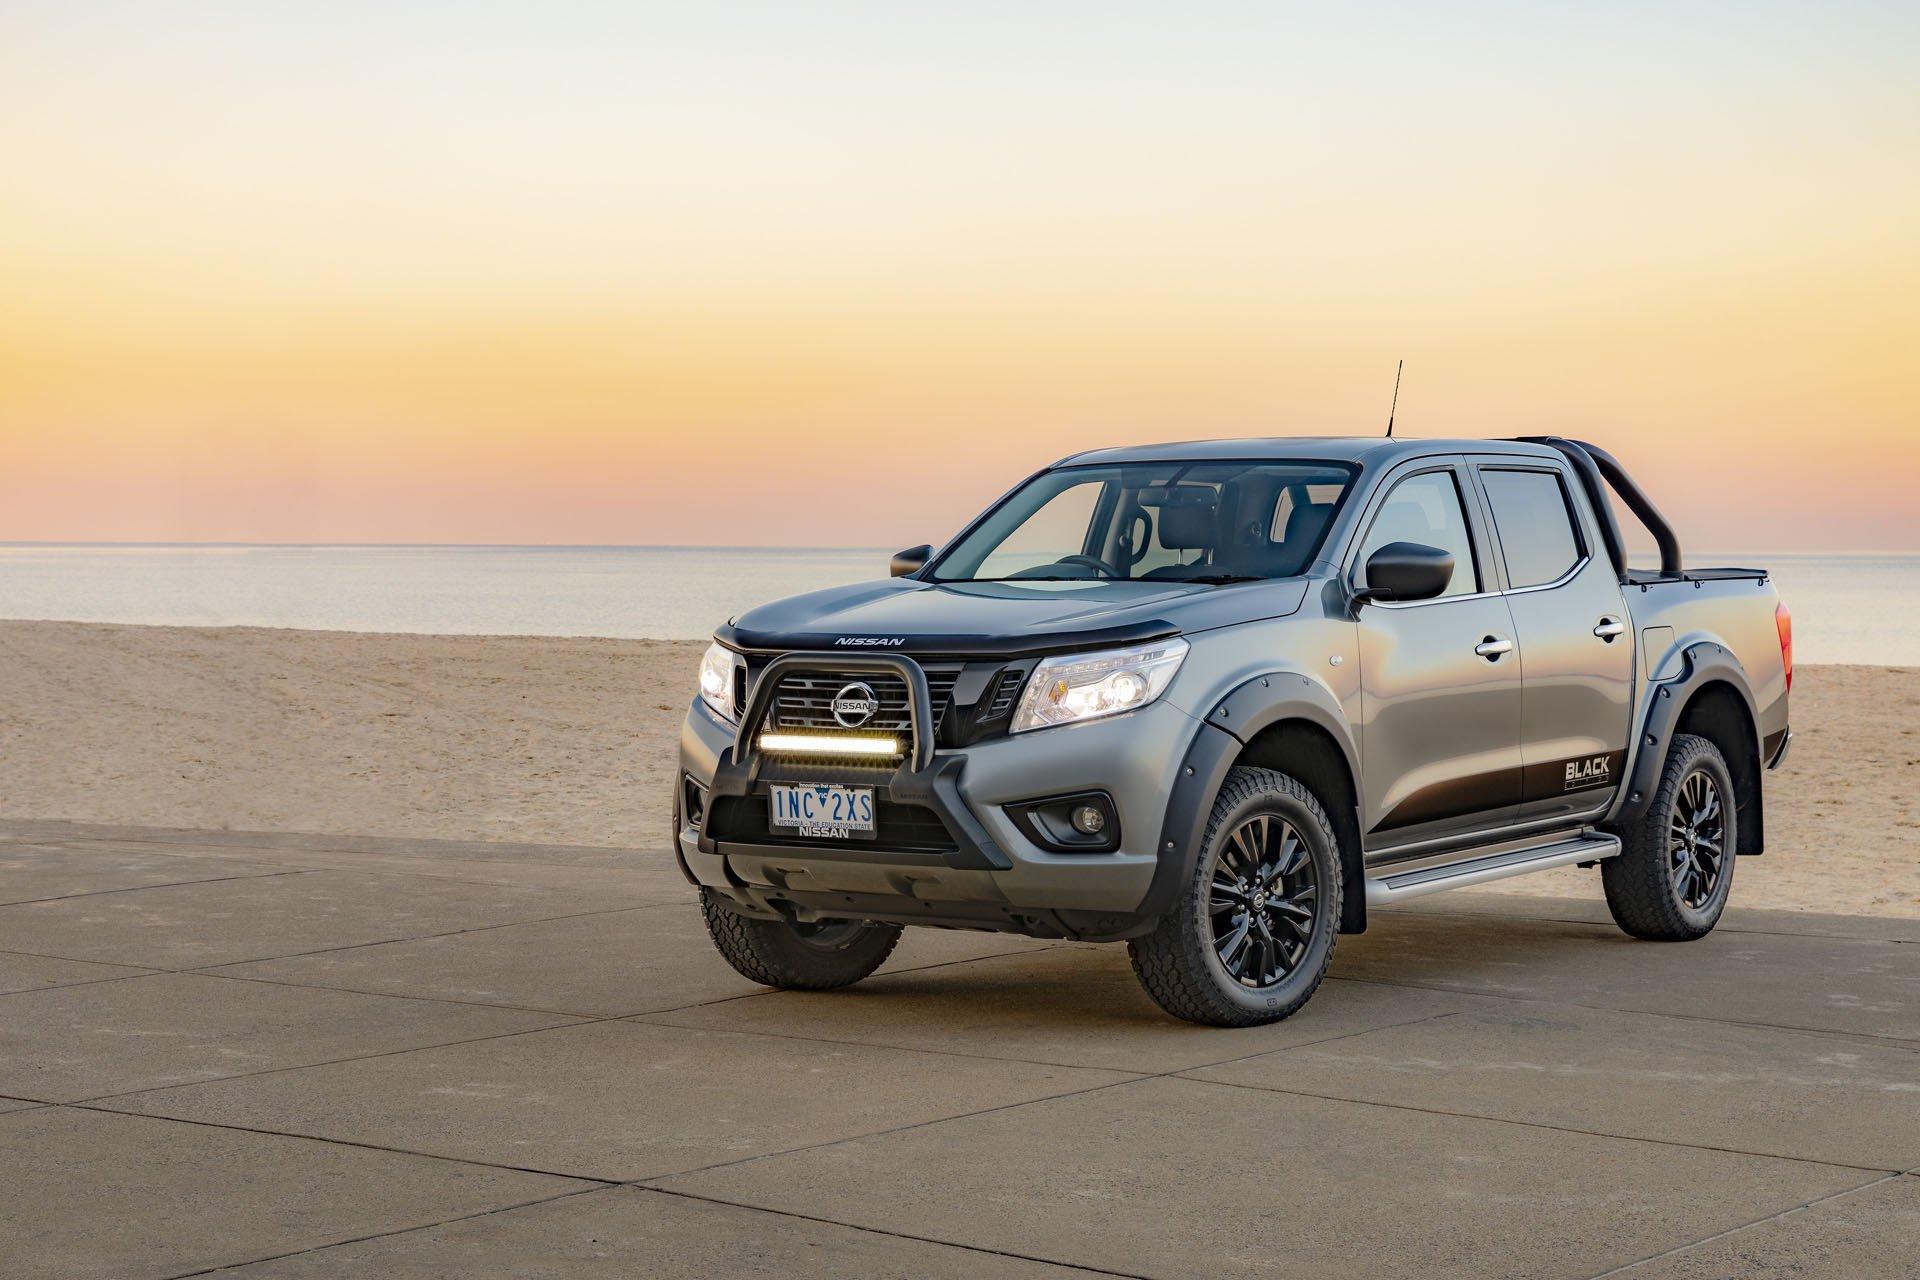 2020 Nissan Frontier Diesel Redesign